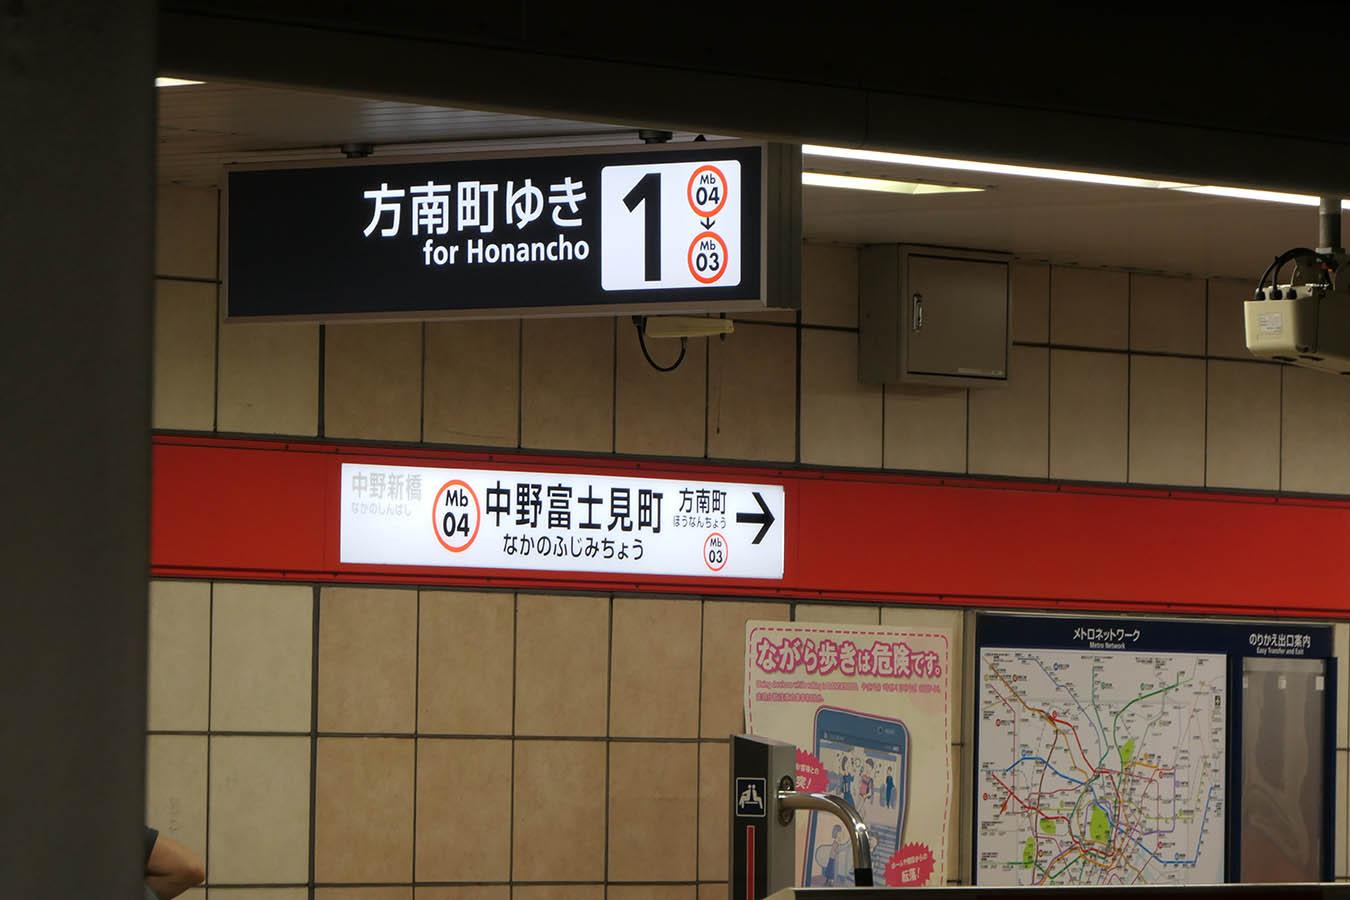 Mb04_photo05.jpg